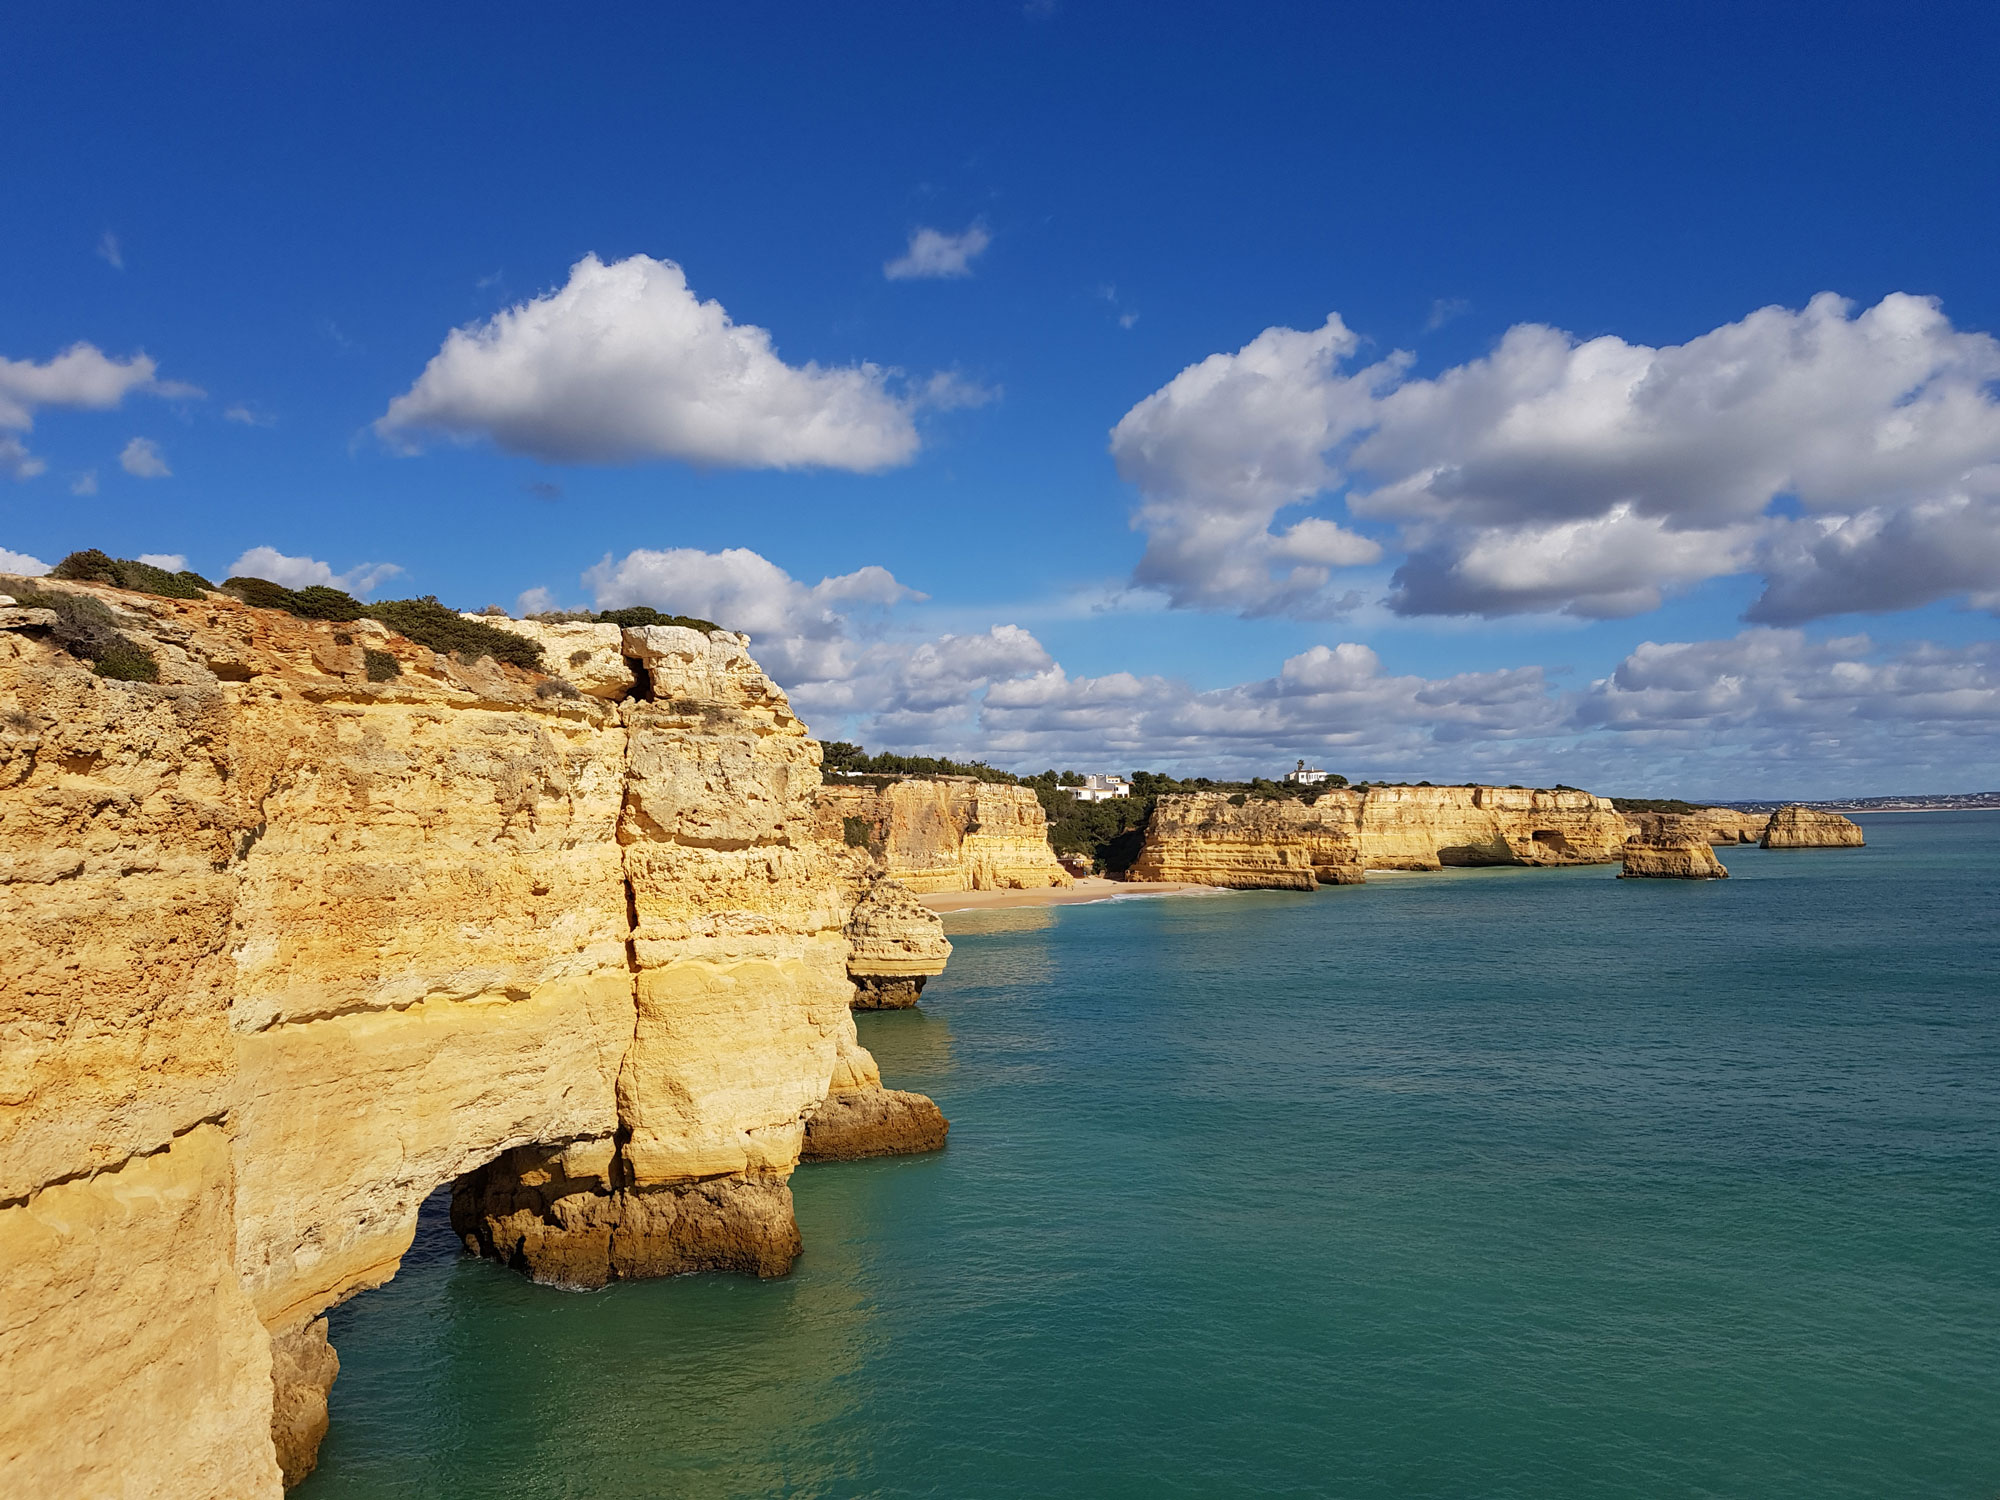 Algarve coastline - Praia Da Marinha